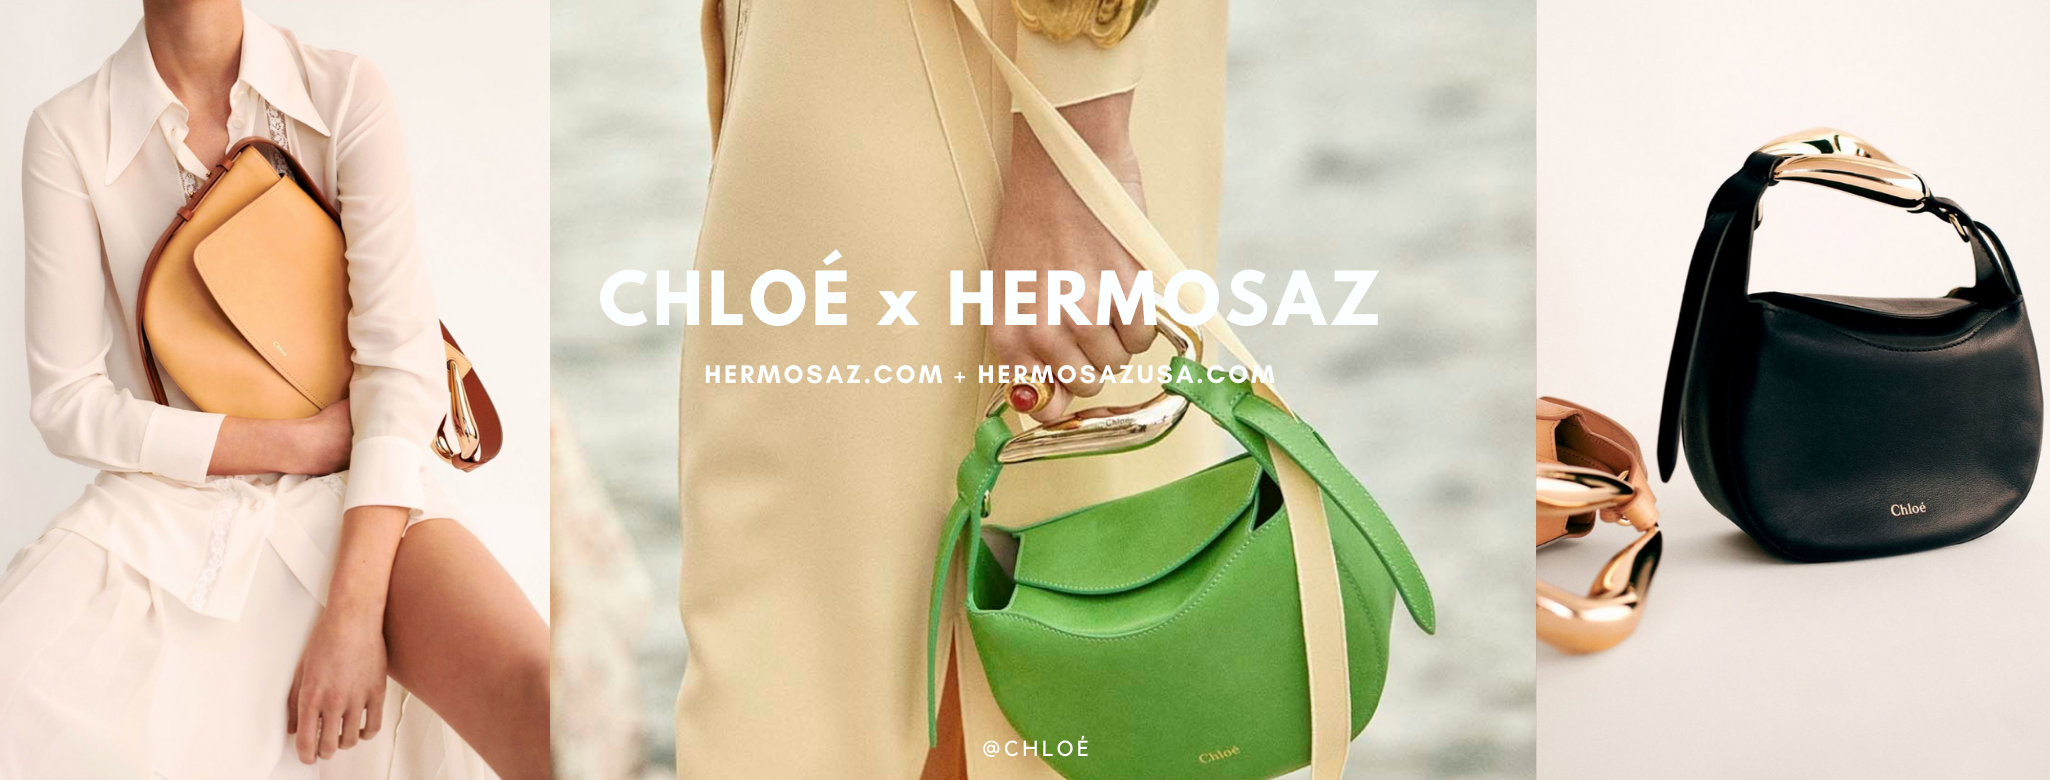 Chloe x Hermosaz